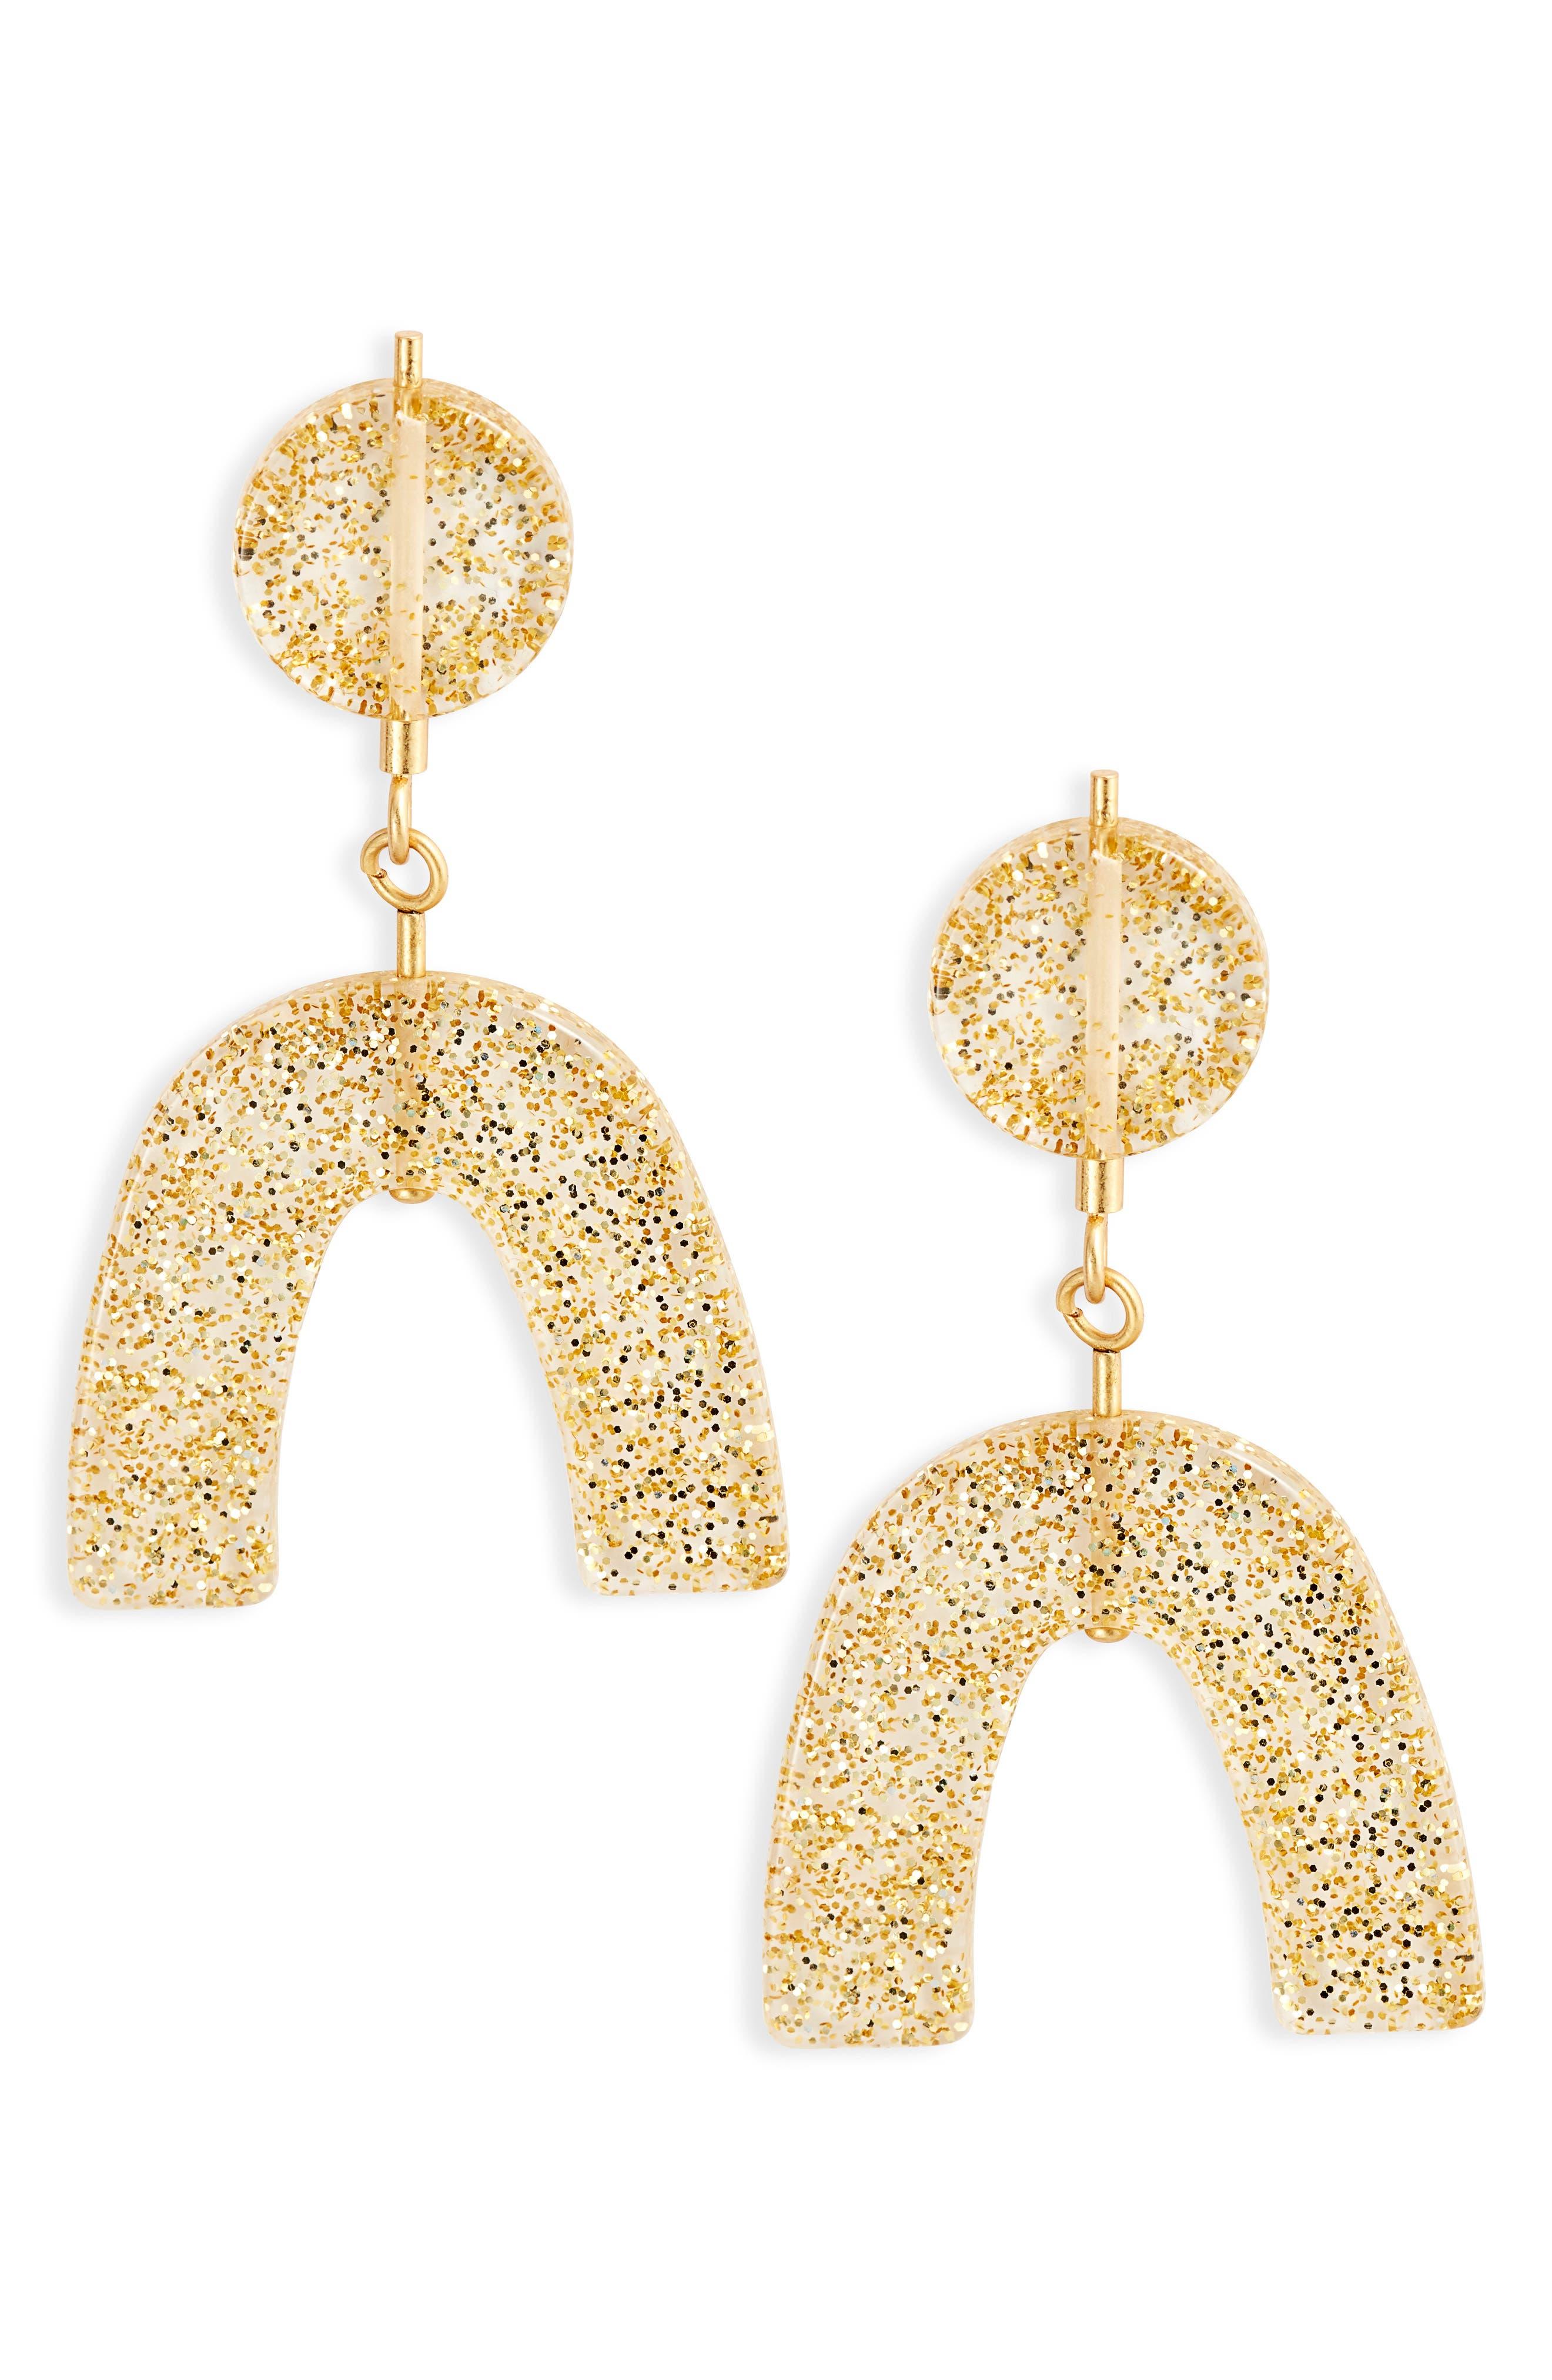 Glitter Shapes Statement Earrings,                             Main thumbnail 1, color,                             GOLD GLITTER